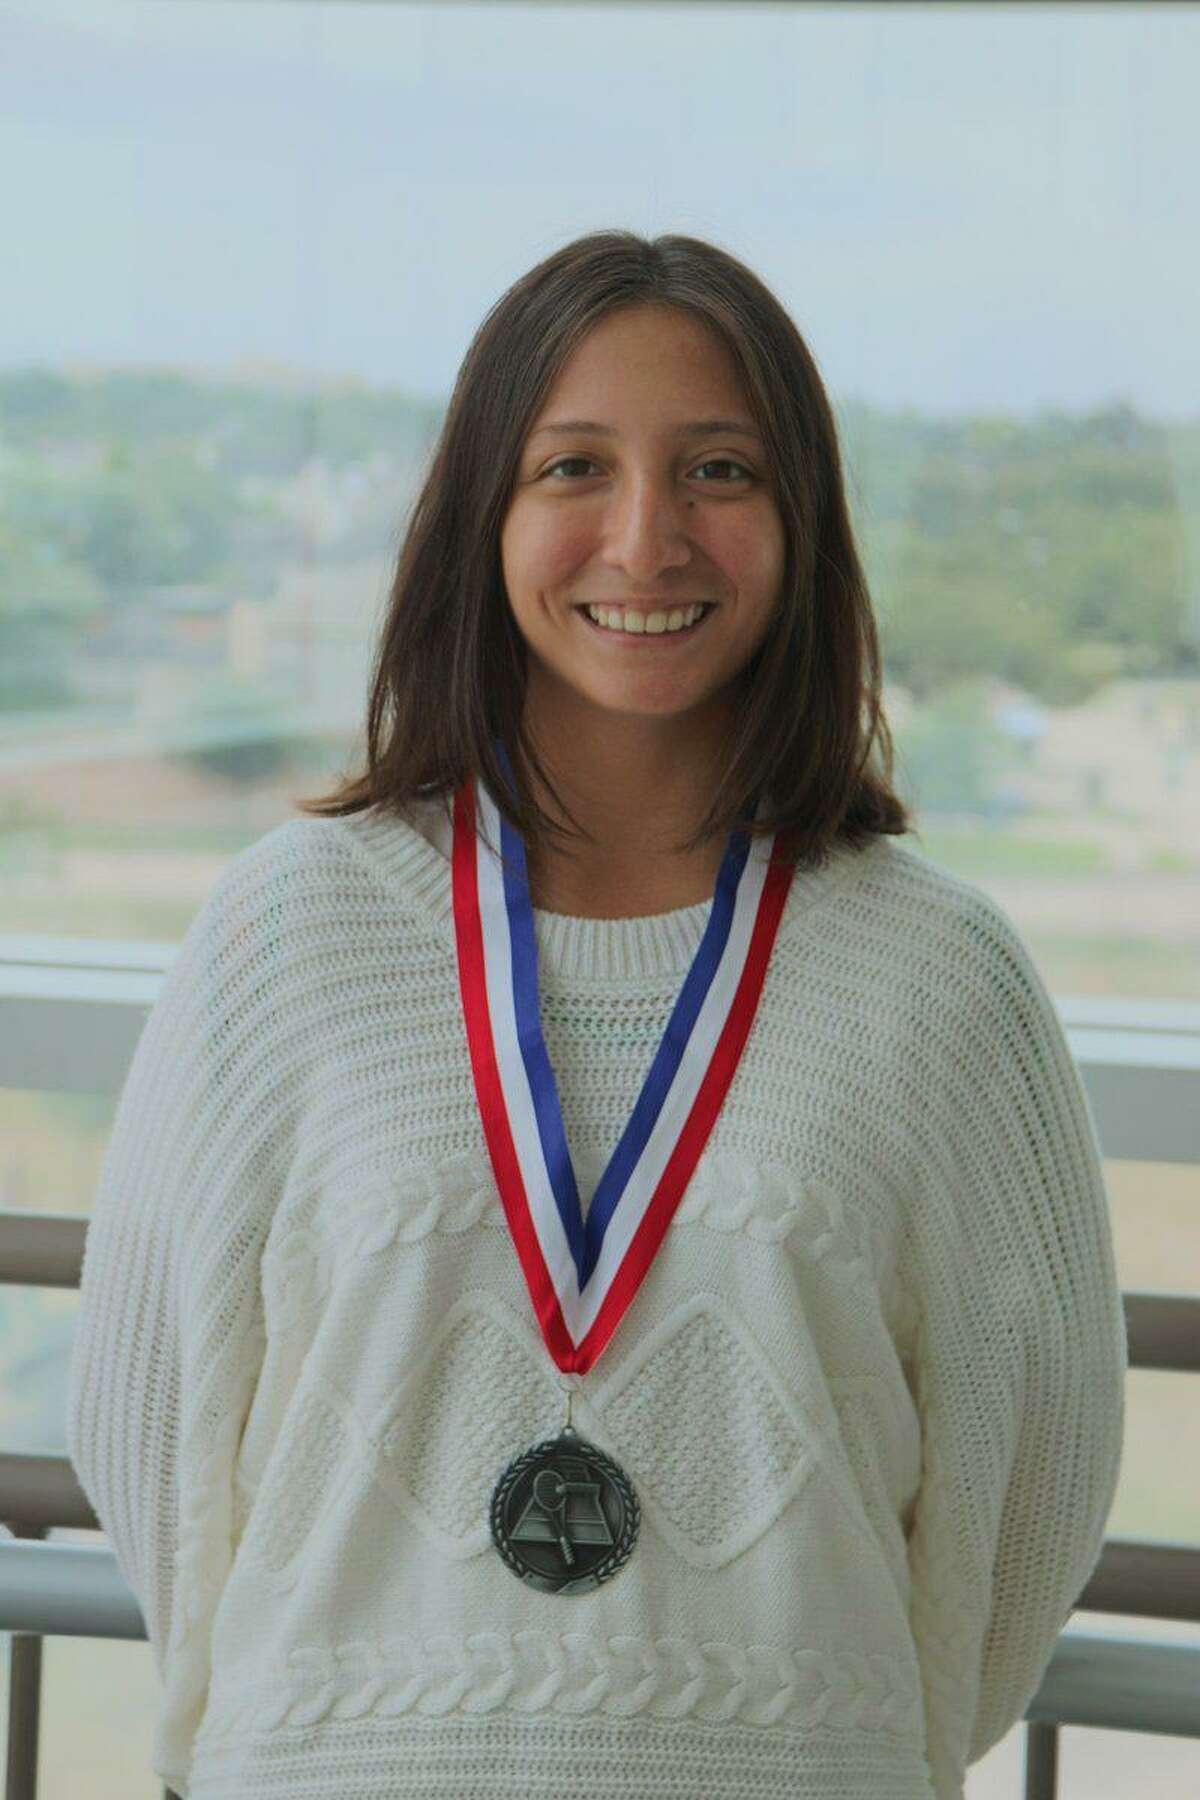 British International School senior Miranda Jimenez was the school's first state tennis qualifier, advancing to the final four in the TAPPS 5A girls singles bracket.